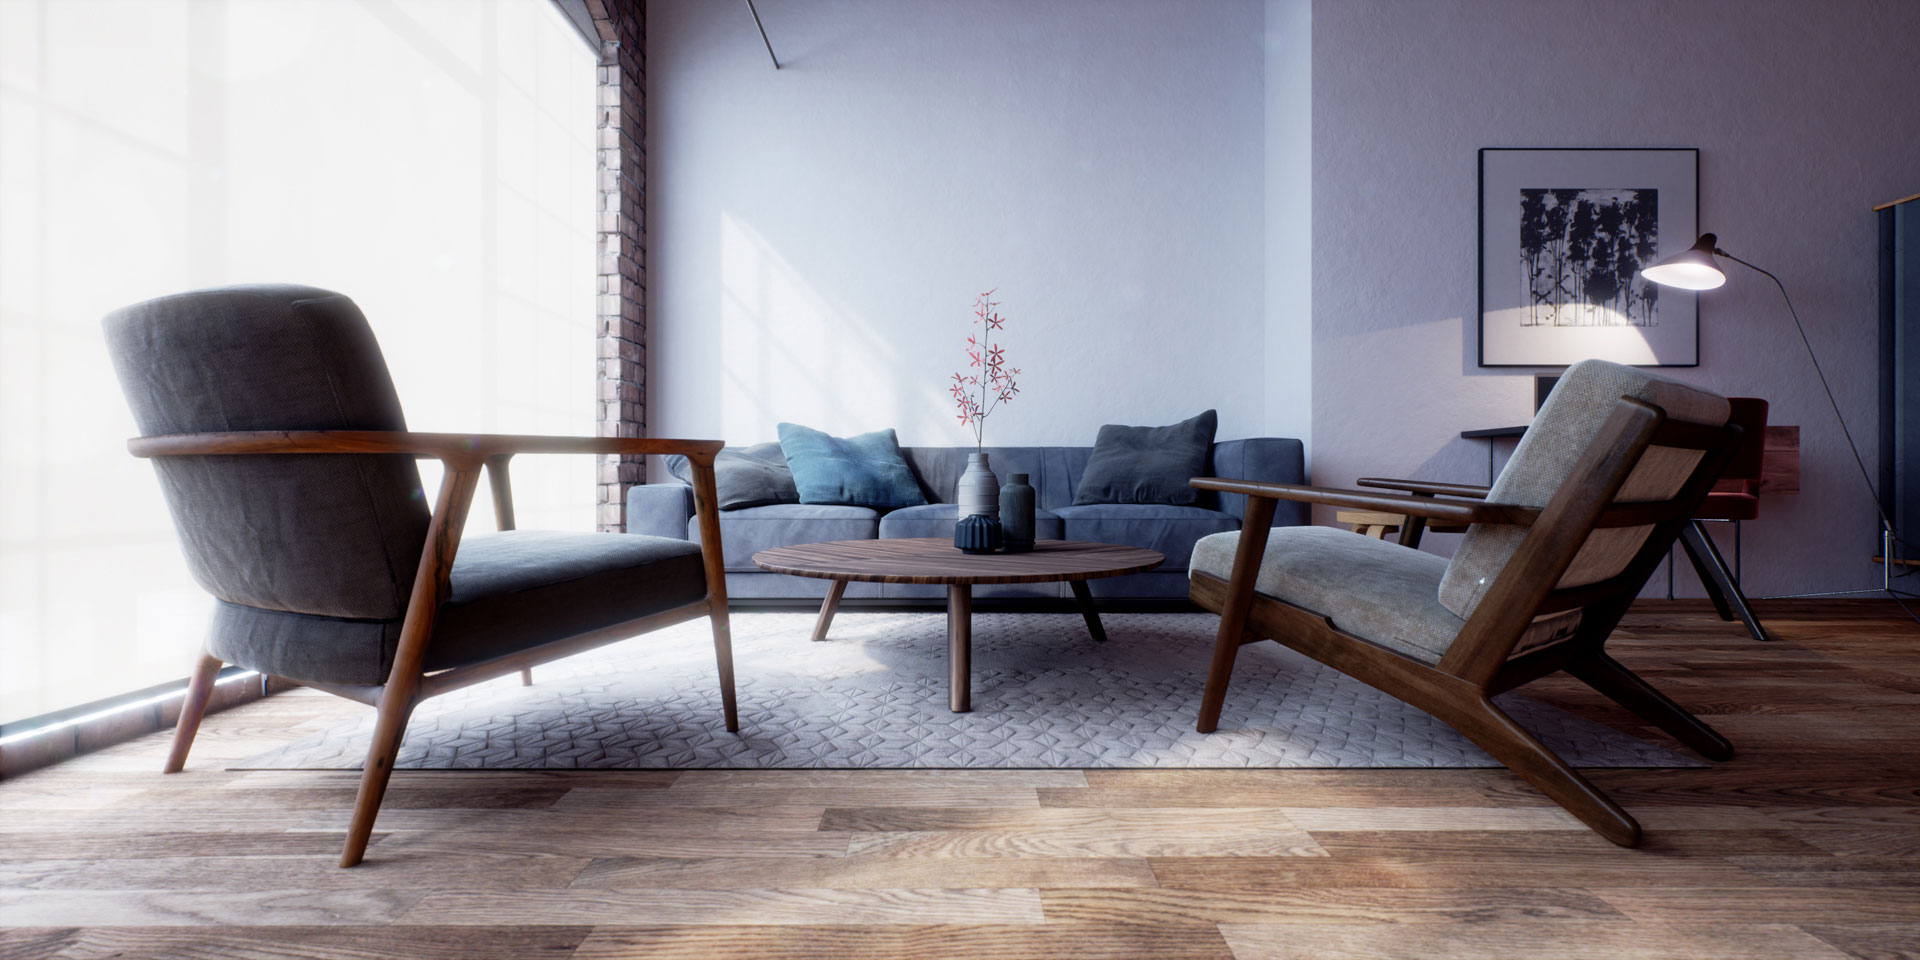 design 3d for architecture